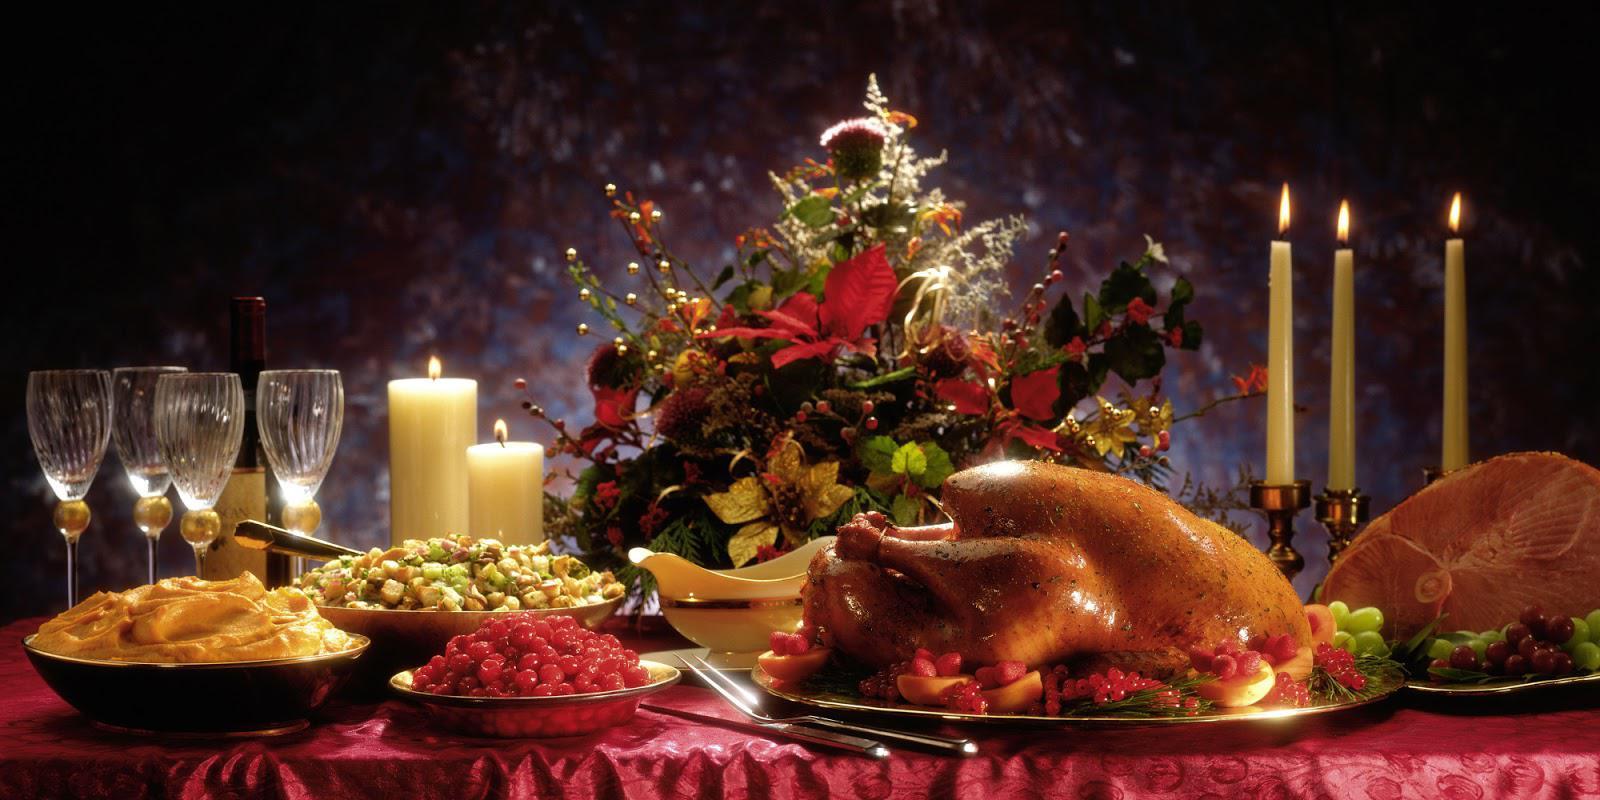 Photo of Μάτια: Ποιες χριστουγεννιάτικες τροφές κάνoυν καλό;